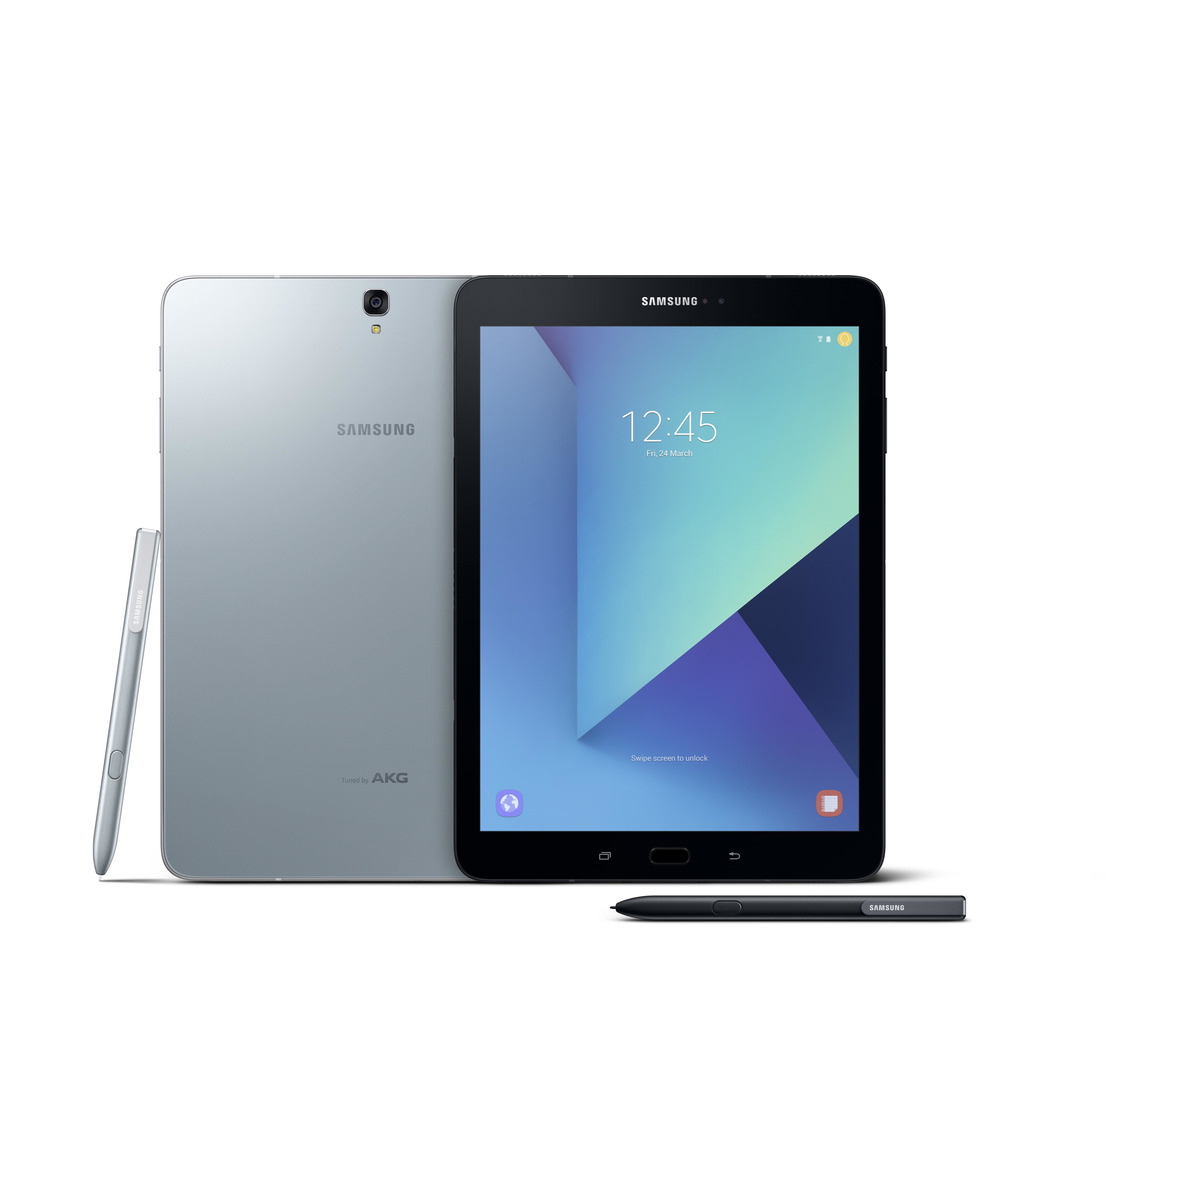 Kjøp din Samsung Galaxy Tab hos POWER til god pris Power.no